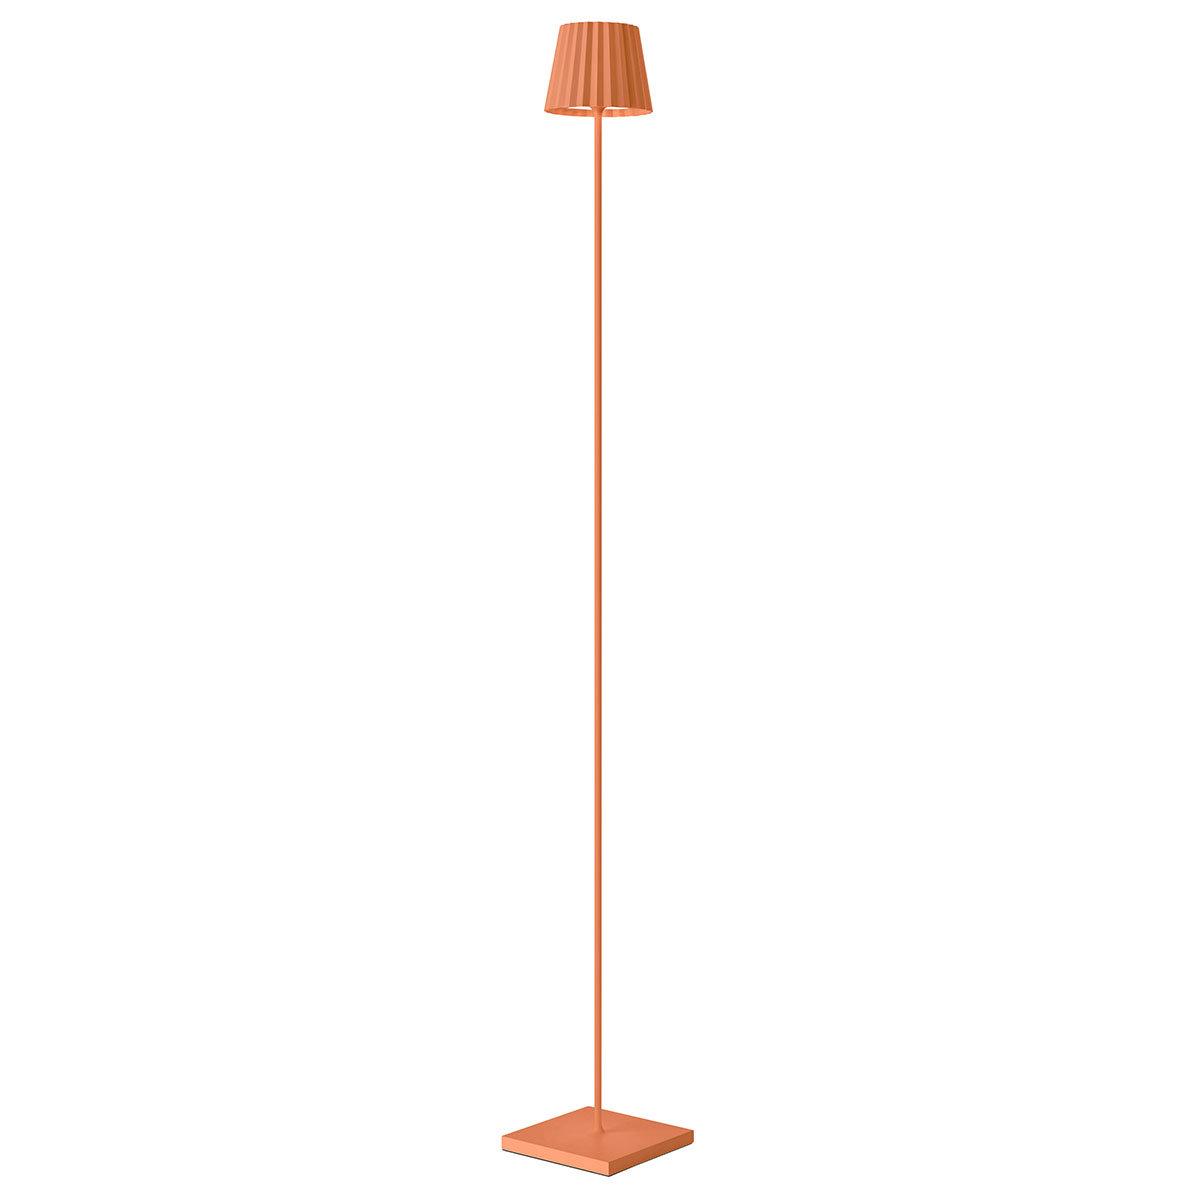 Akku Stehleuchte Troll, 120x15x15 cm, Aluminium, orange